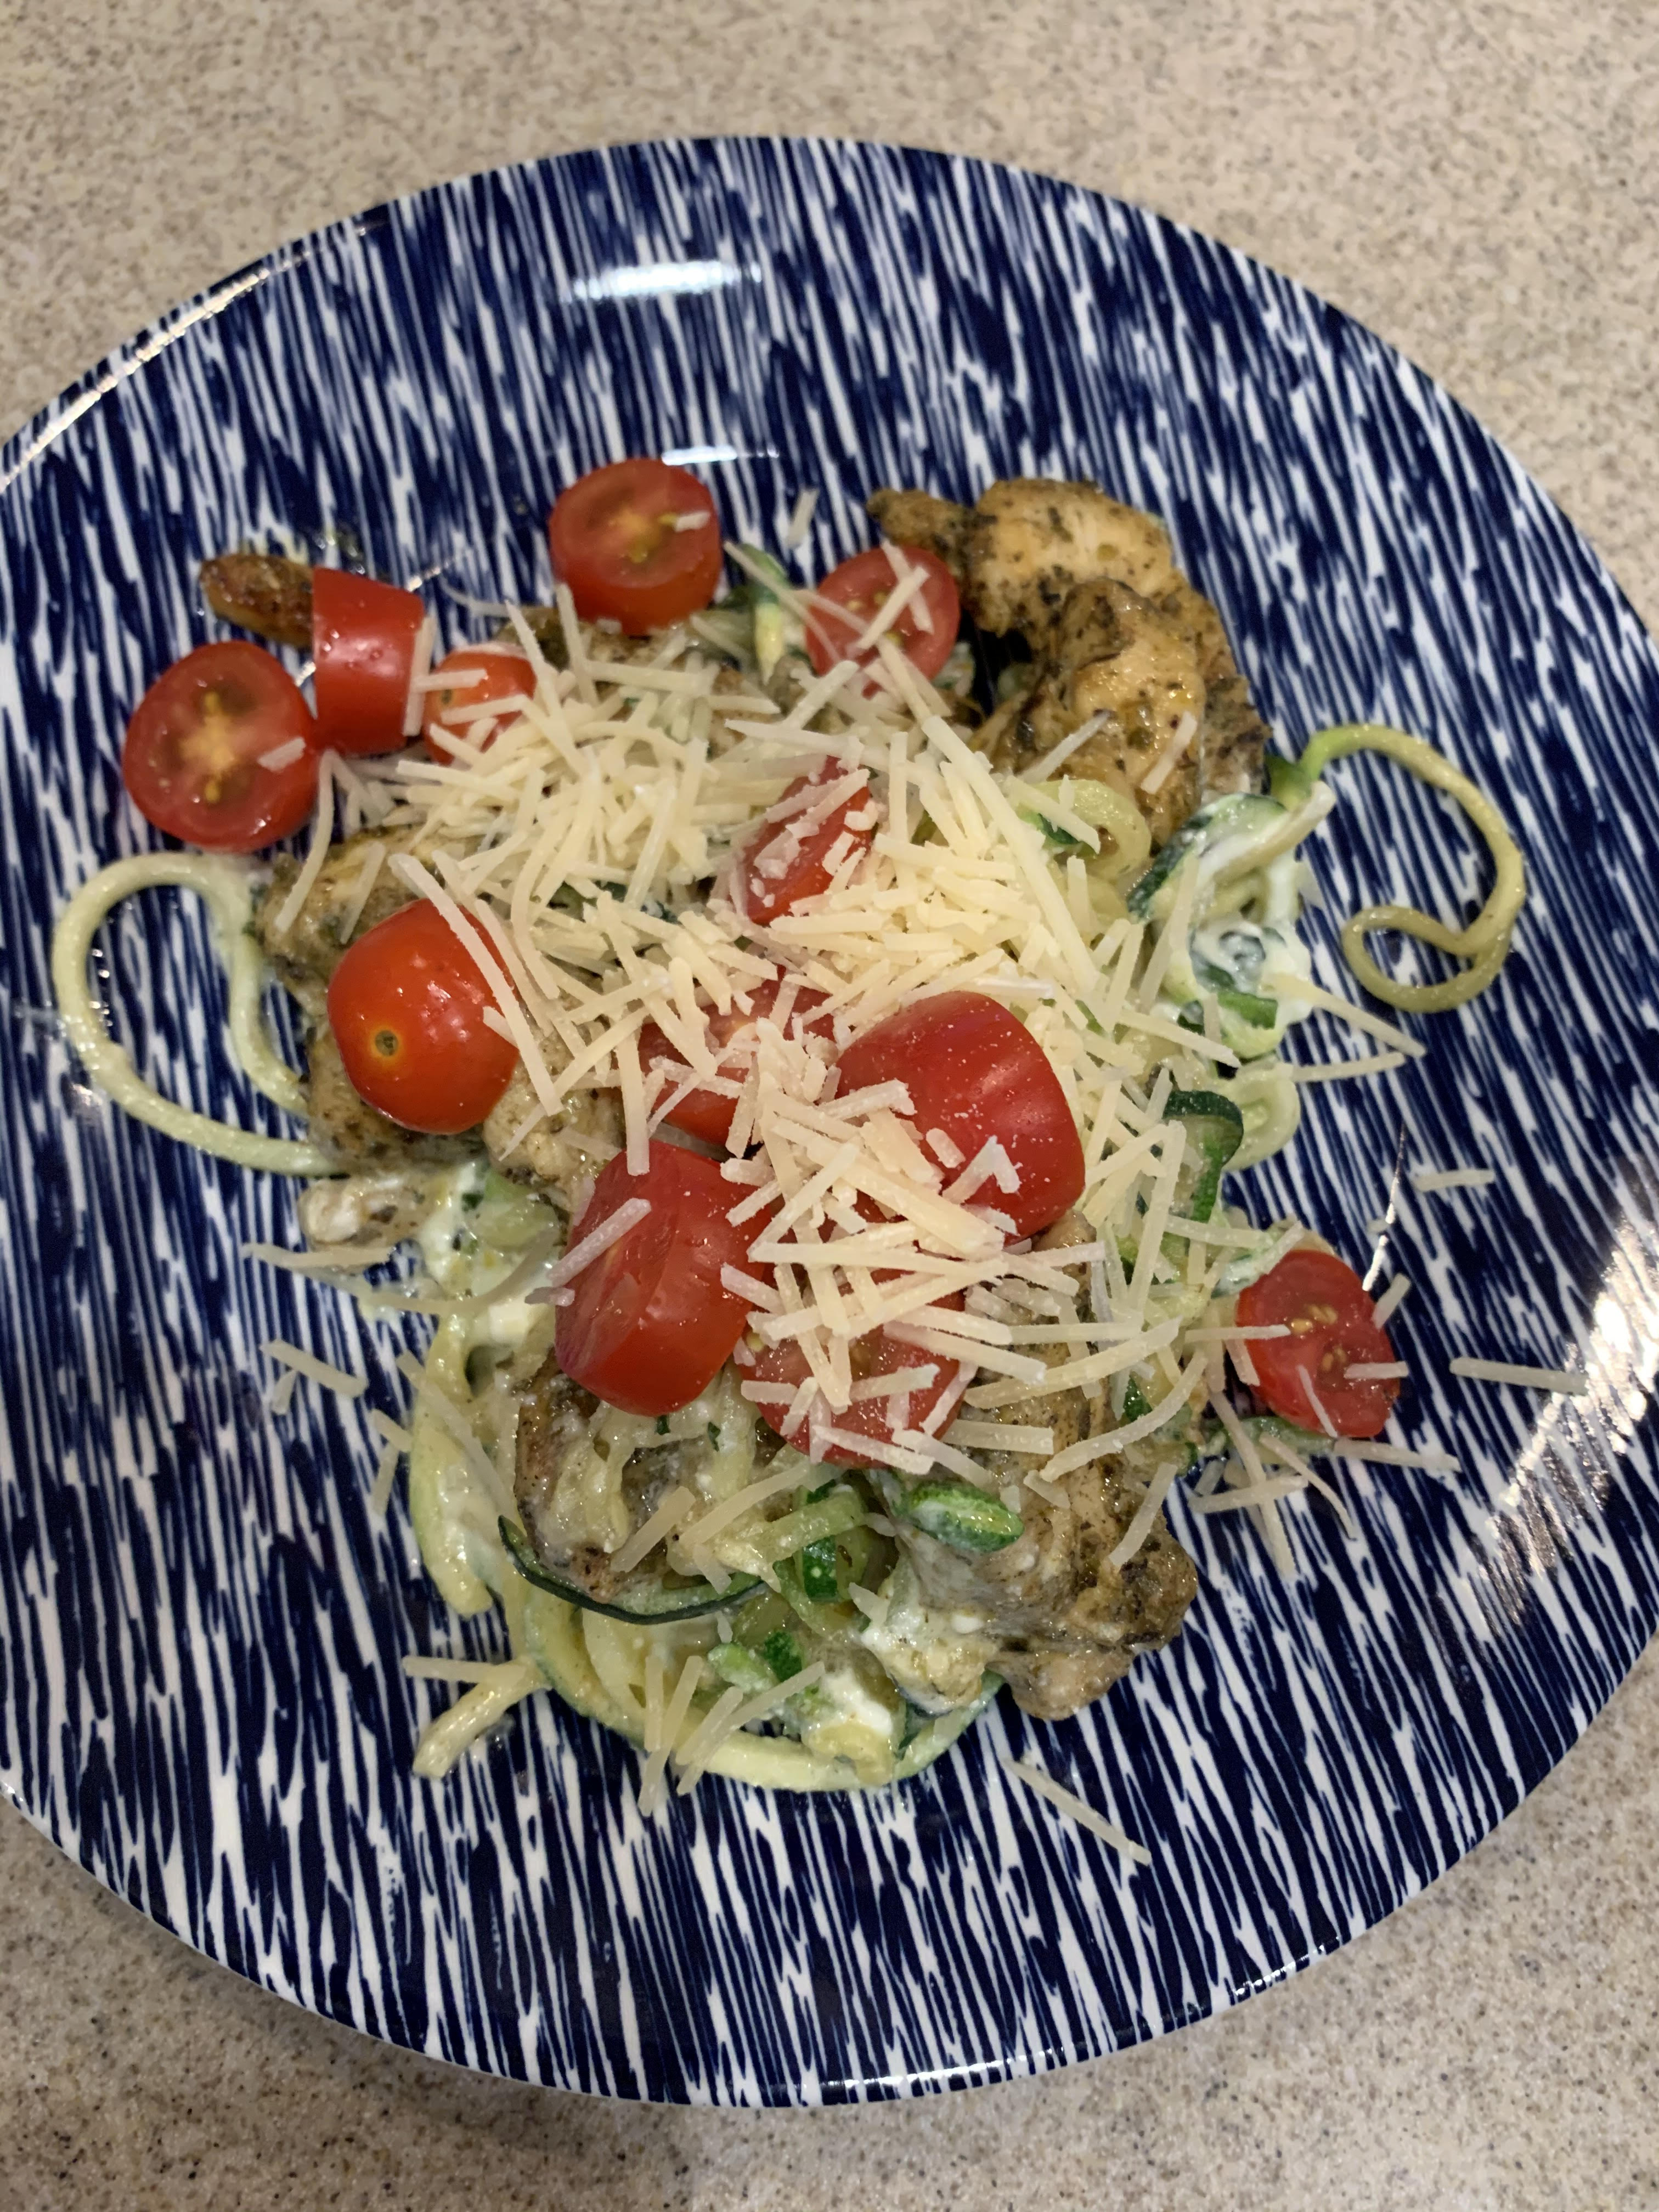 Lemon Herb Chicken with Zucchini Pasta and Ricotta dbqgal59@gmail.com